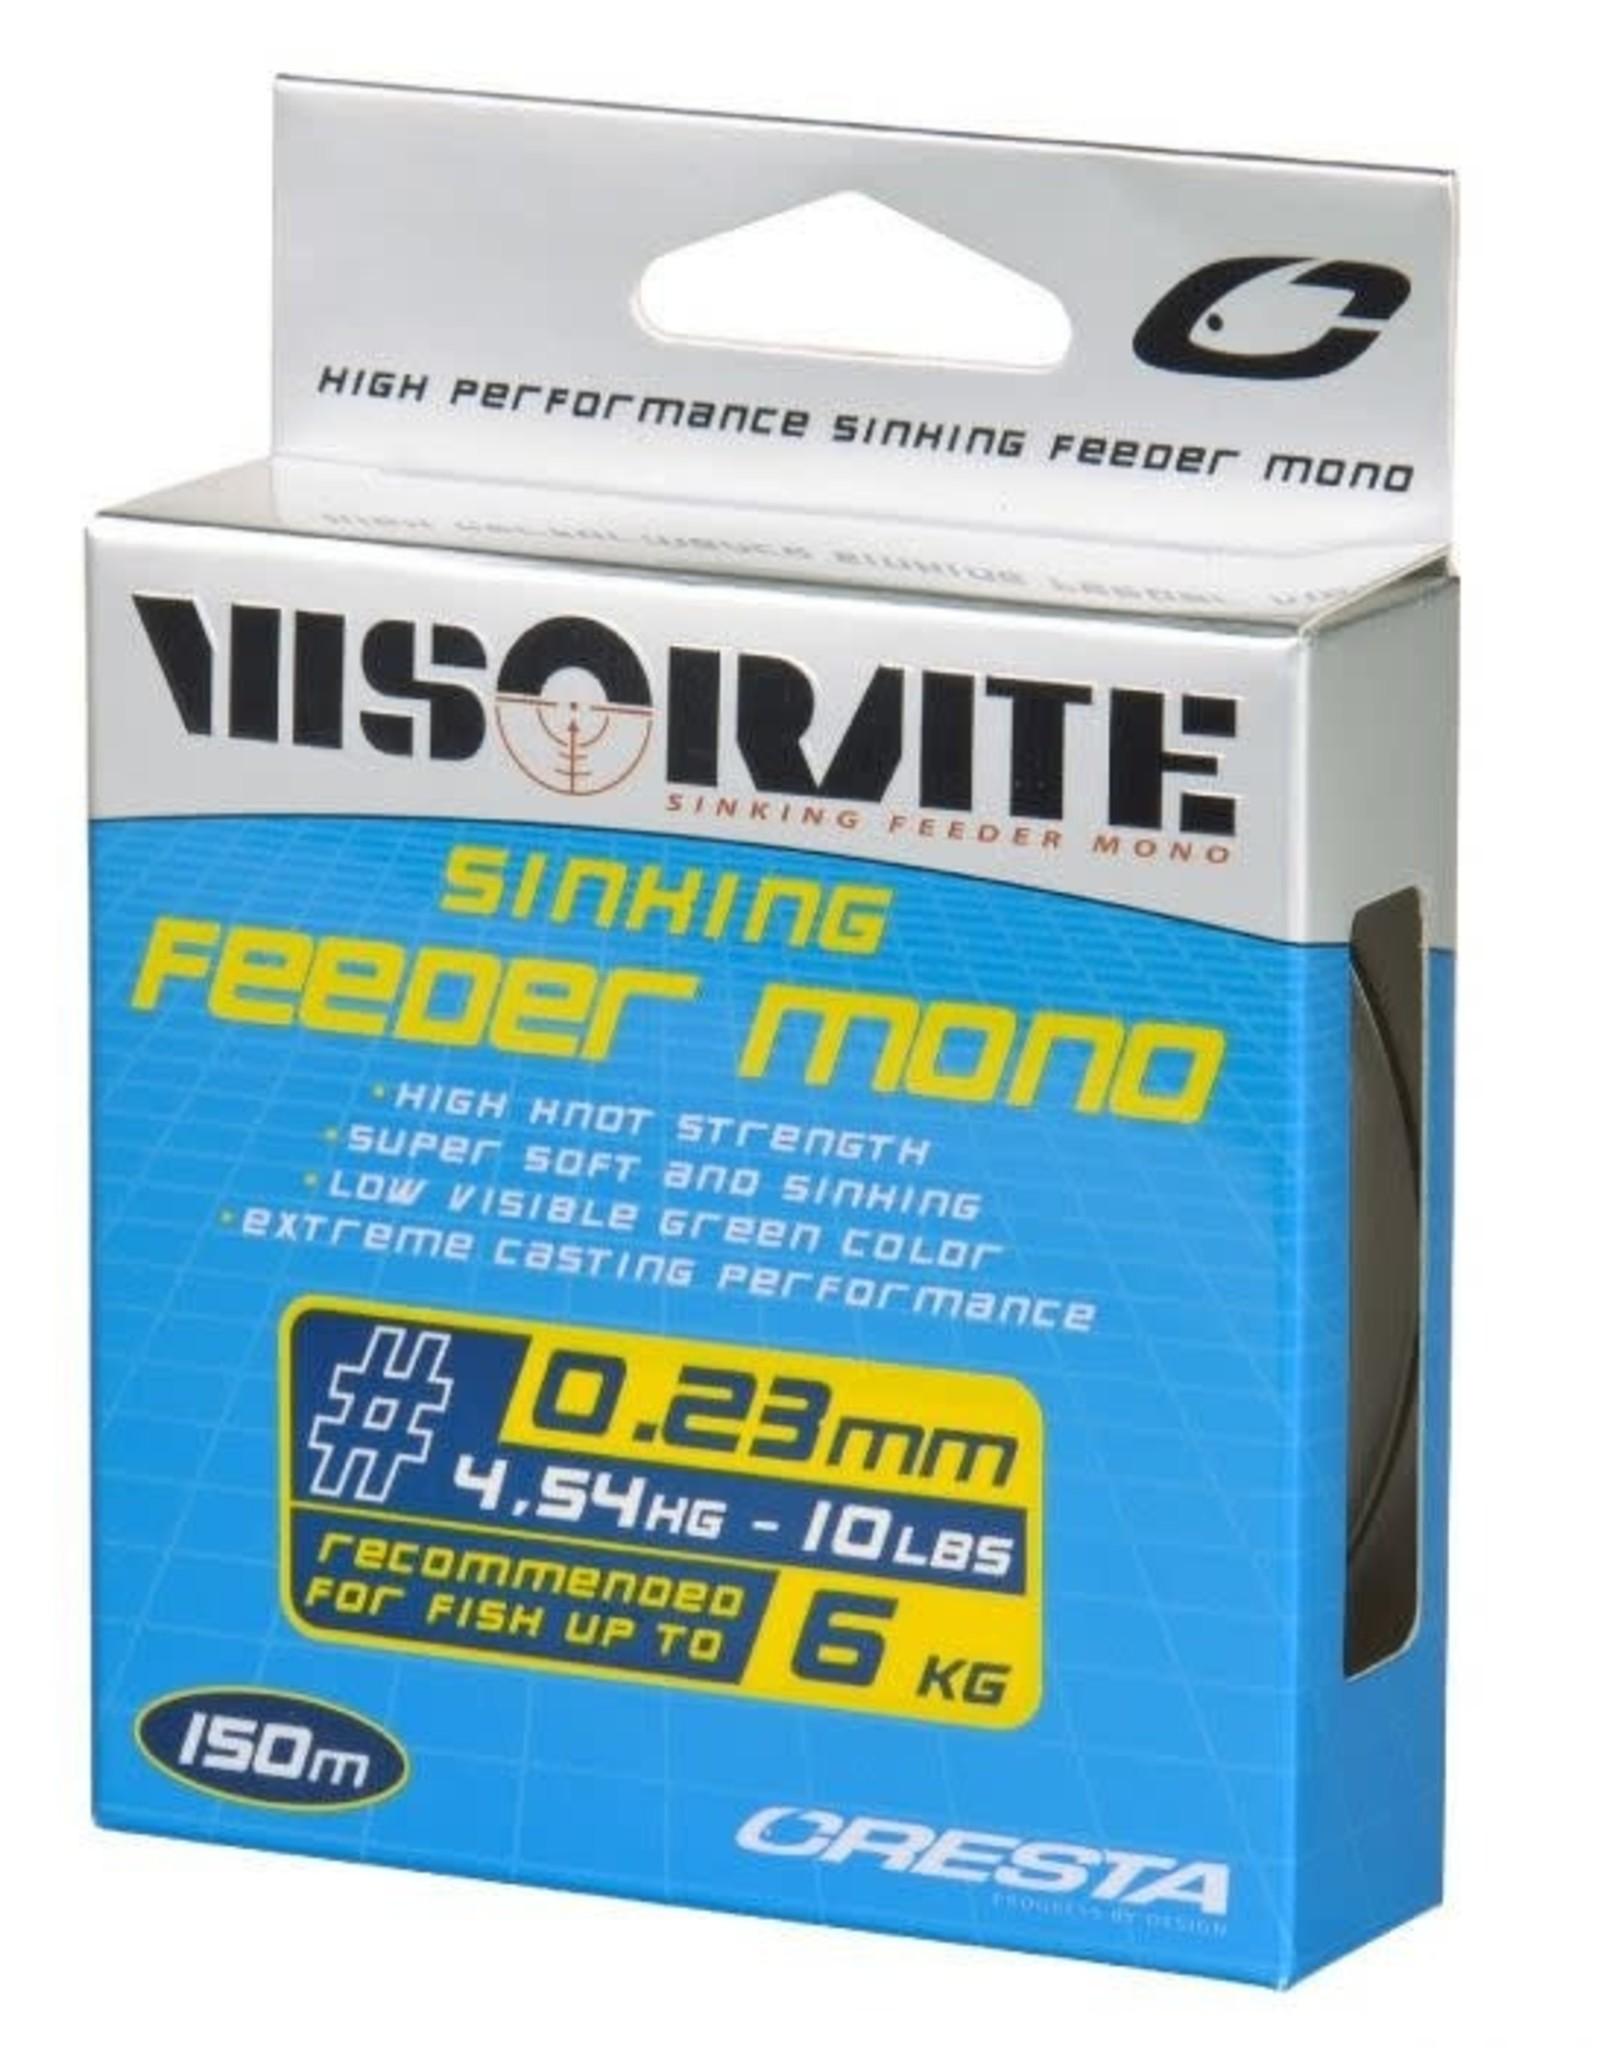 CRESTA VISORATE FEEDER MONO 0.23MM 150M